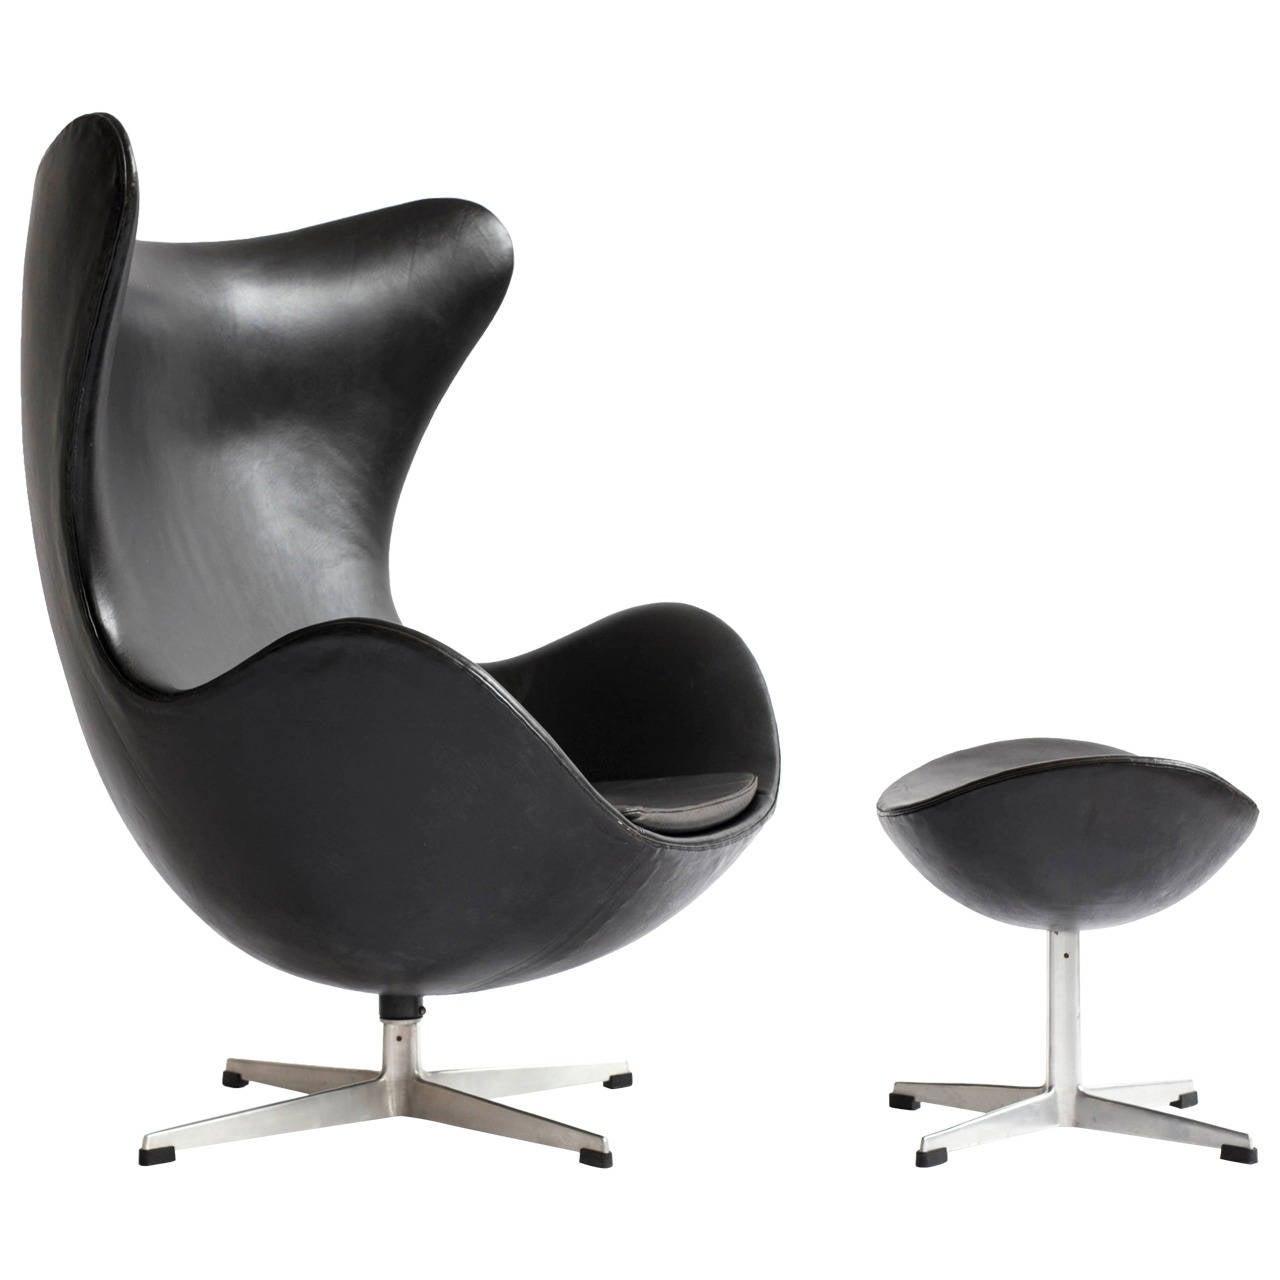 arne jacobsen egg chair with stool at 1stdibs. Black Bedroom Furniture Sets. Home Design Ideas